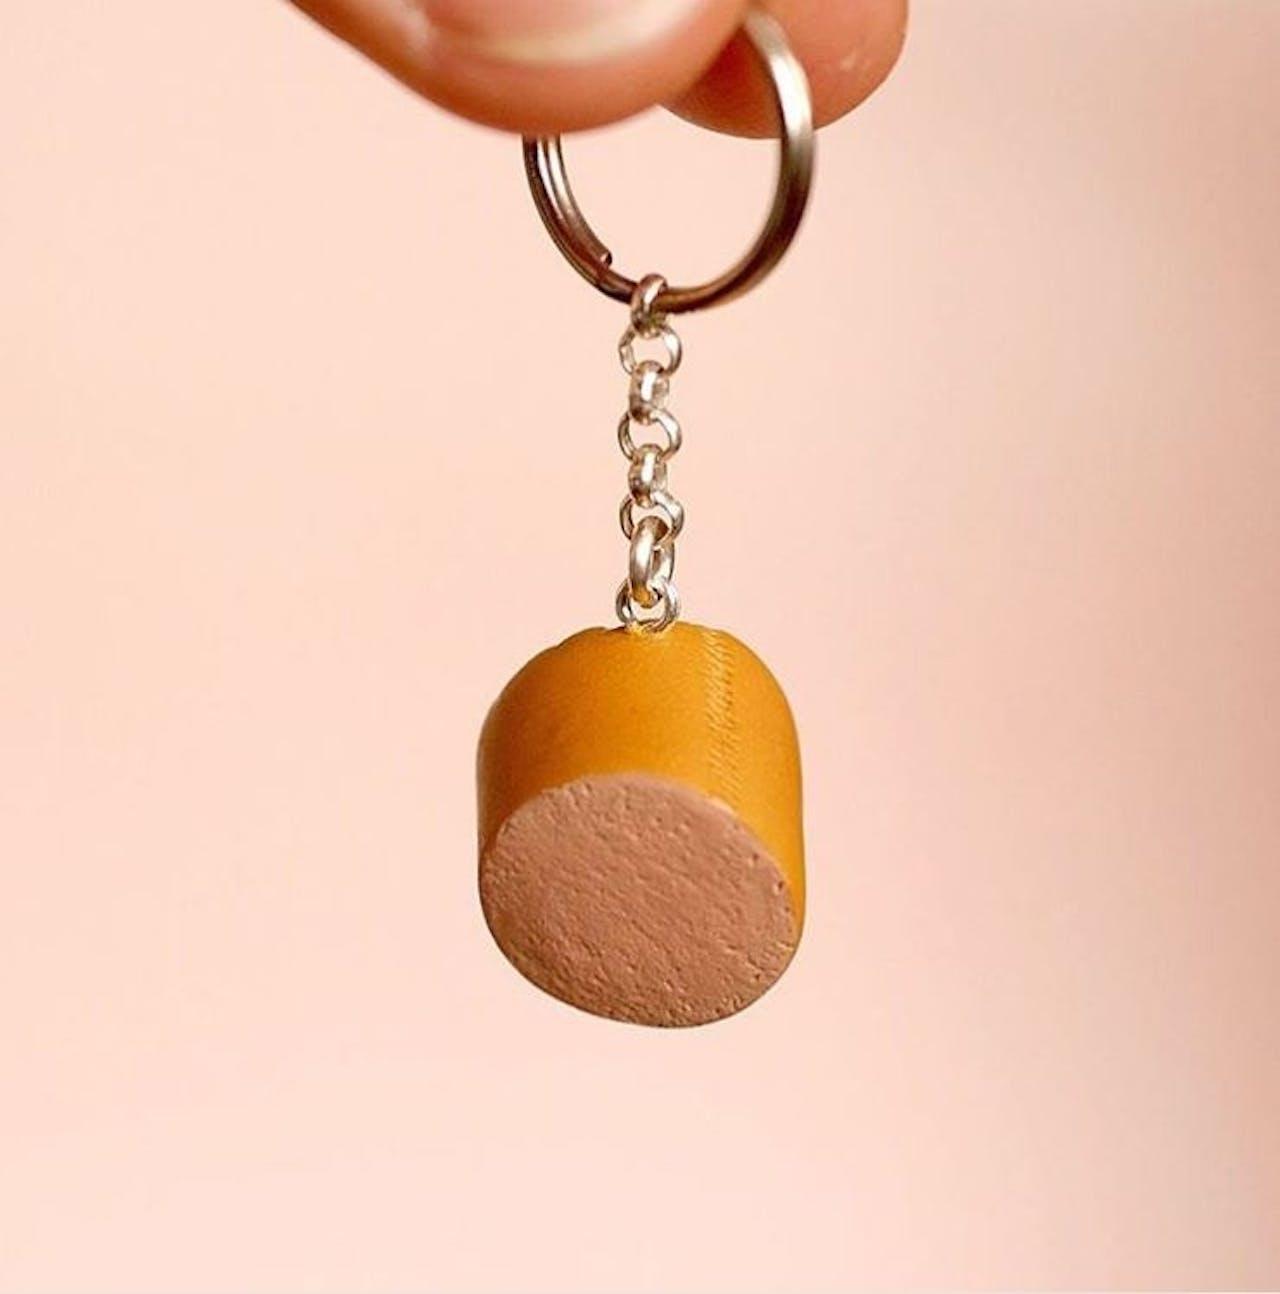 Miniaturen von Kamilla Kleinschmidt (Minischmidtblog) - Leberwurst